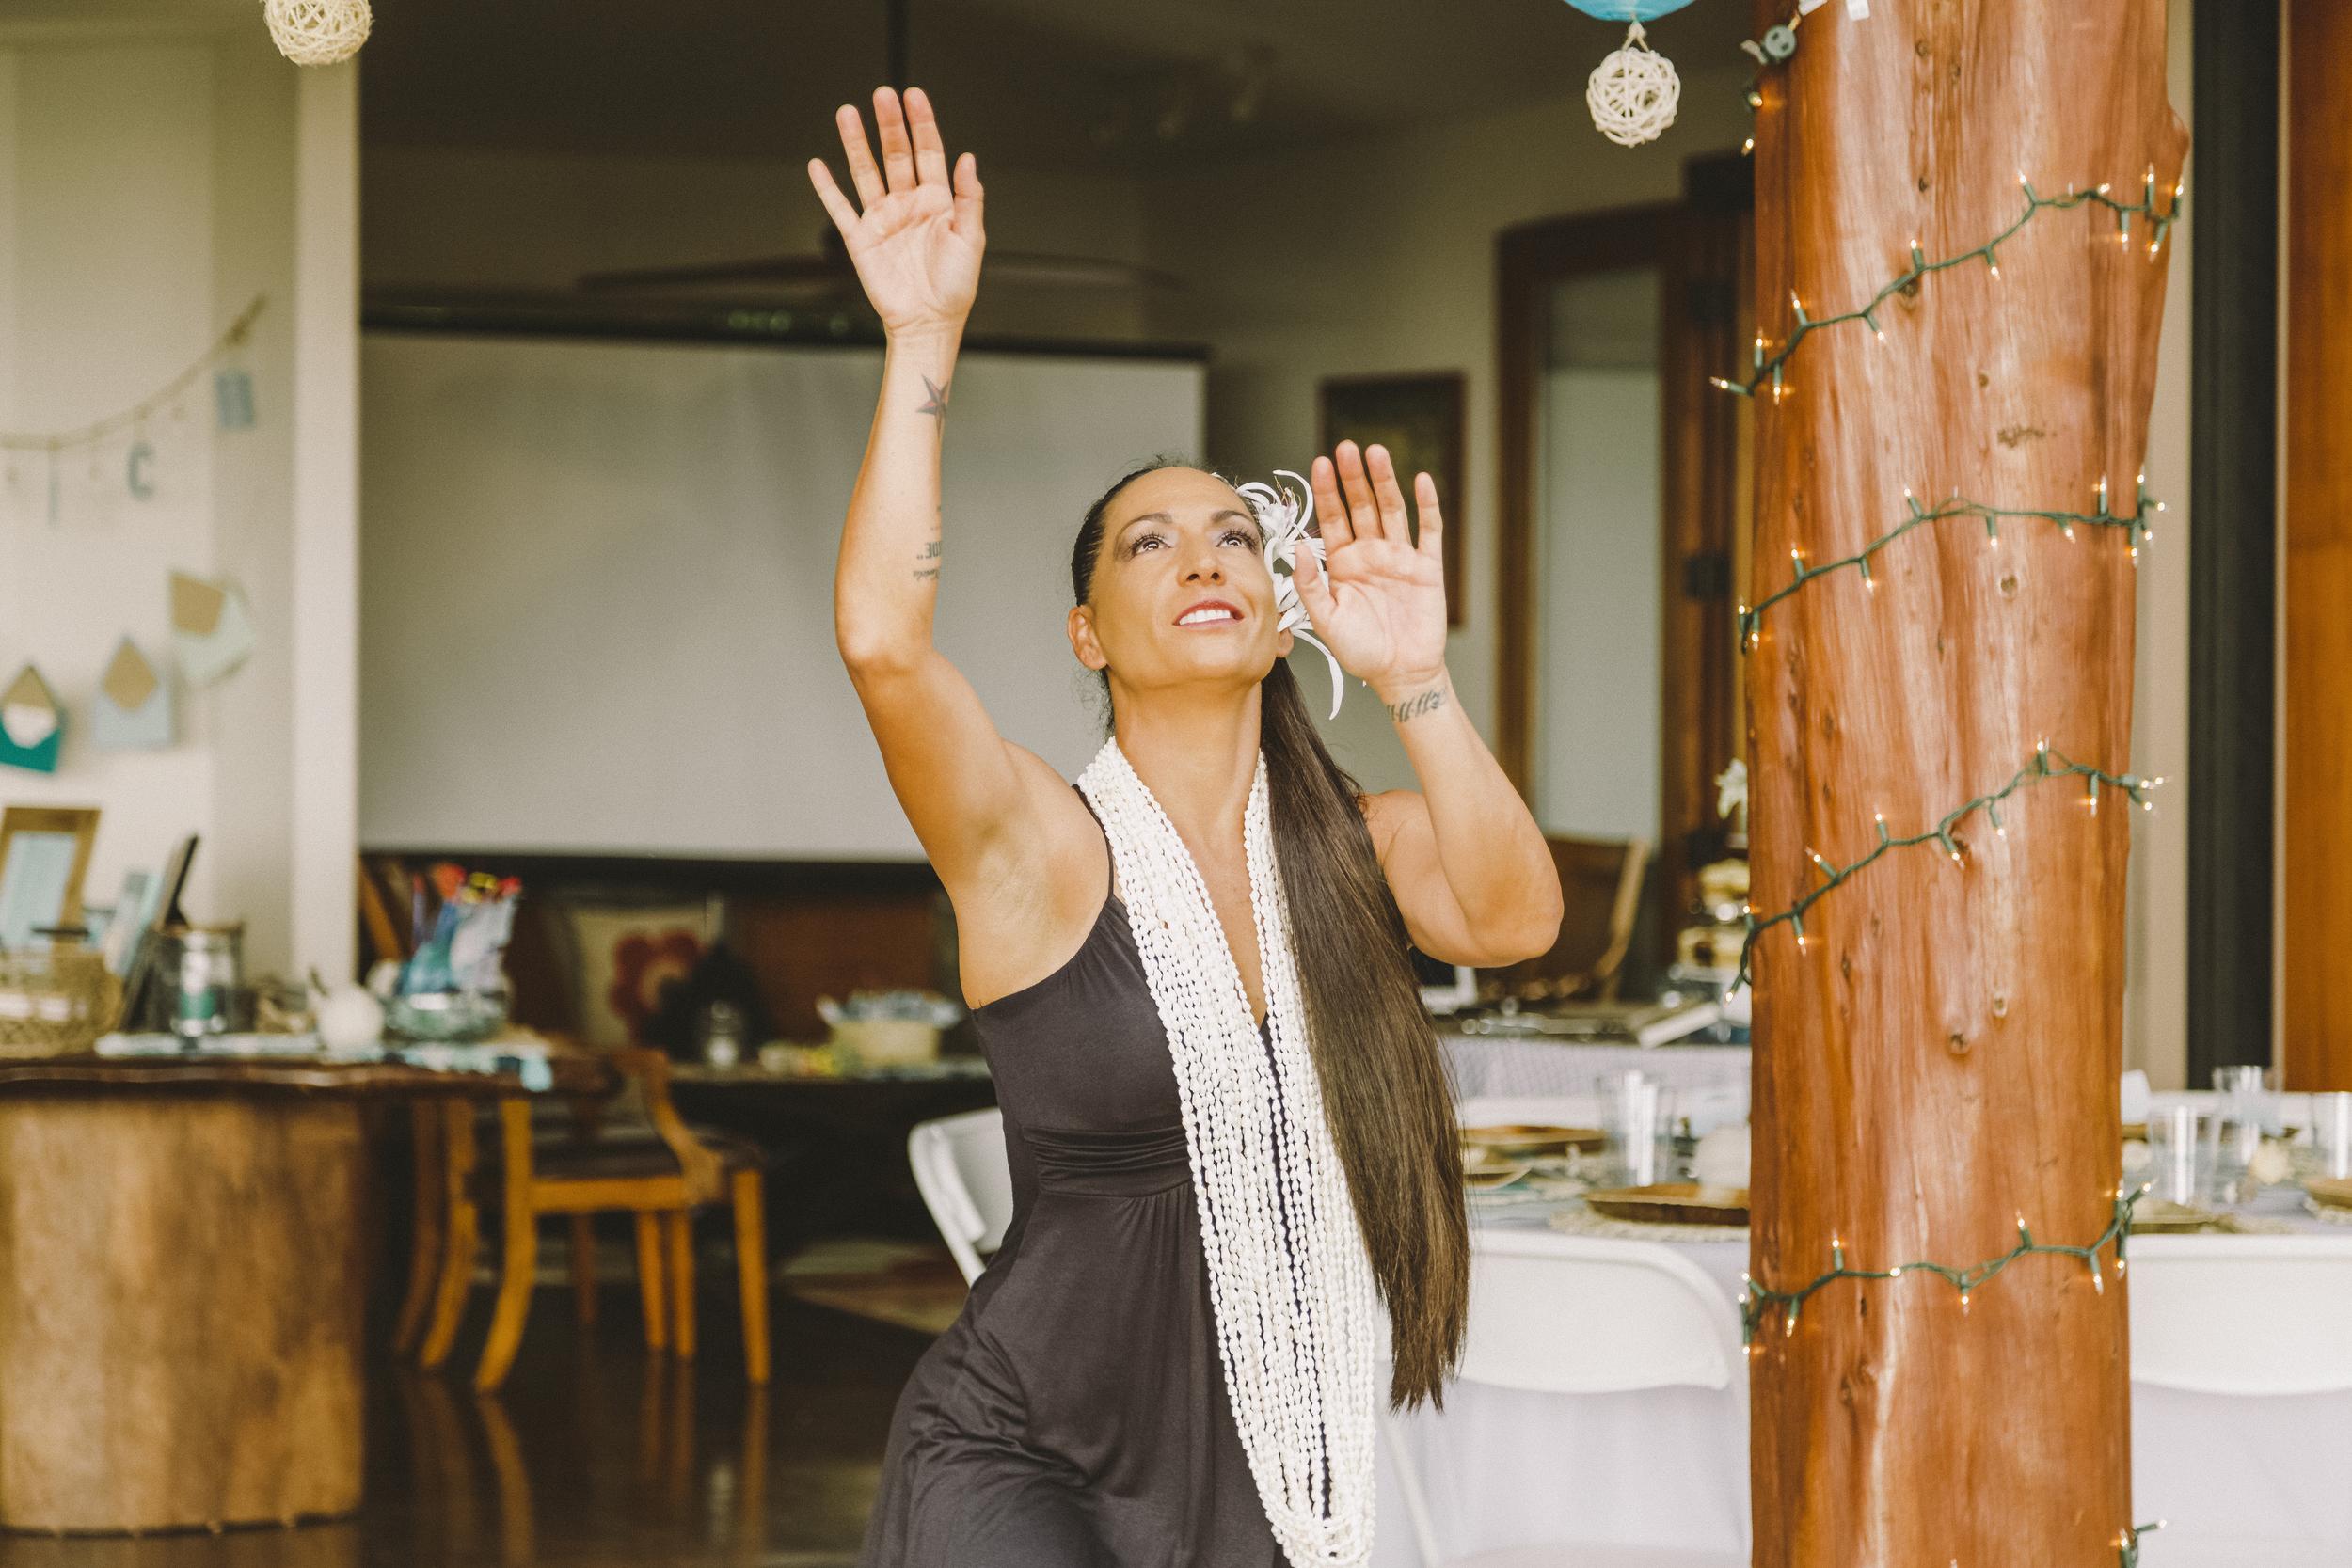 angie-diaz-photography-hawaii-wedding-photographer-kelli-jay-112.jpg